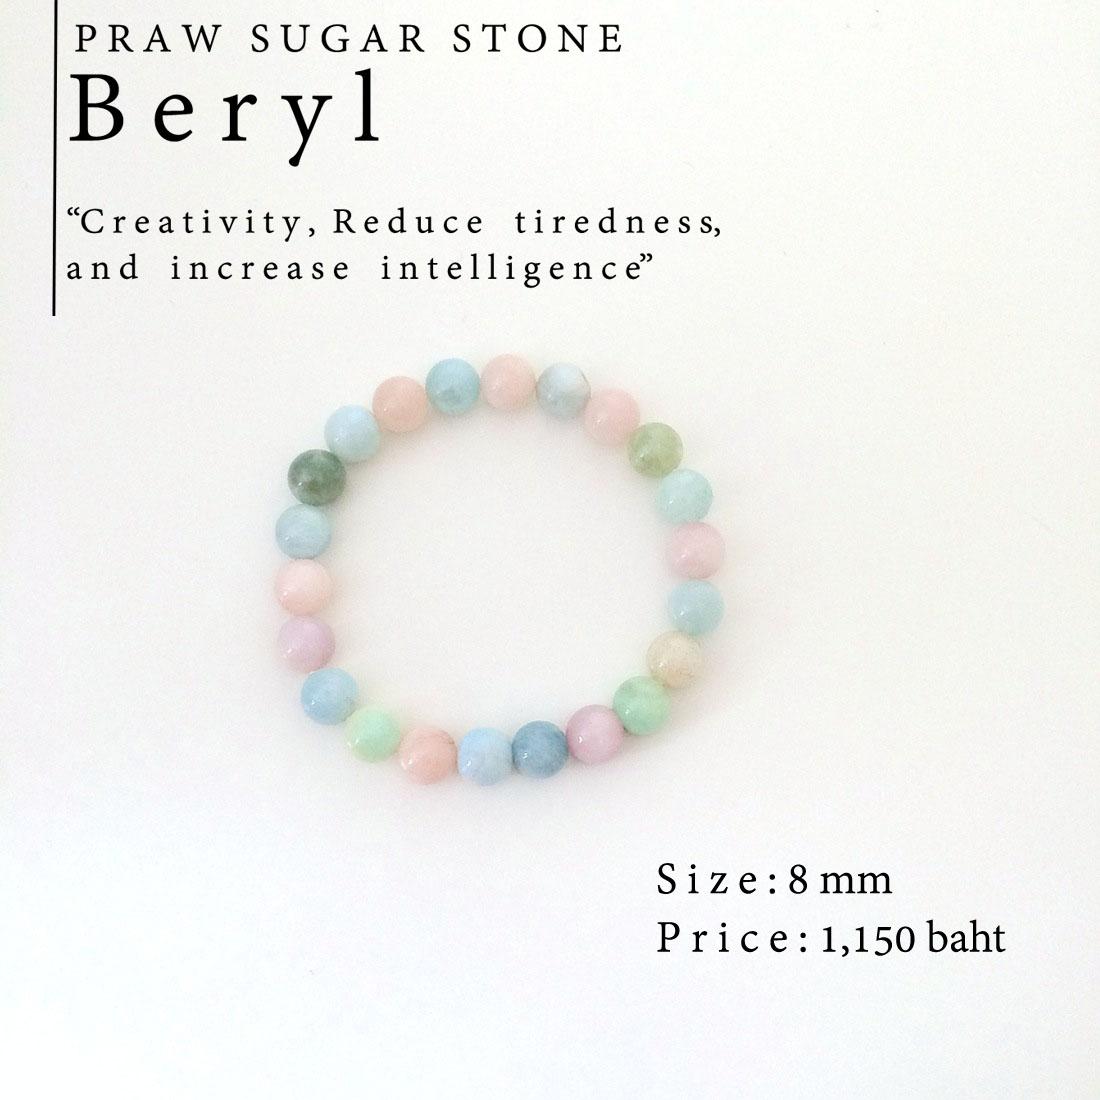 Beryl Bracelet 8mm - กำไลข้อมือหินแบริล